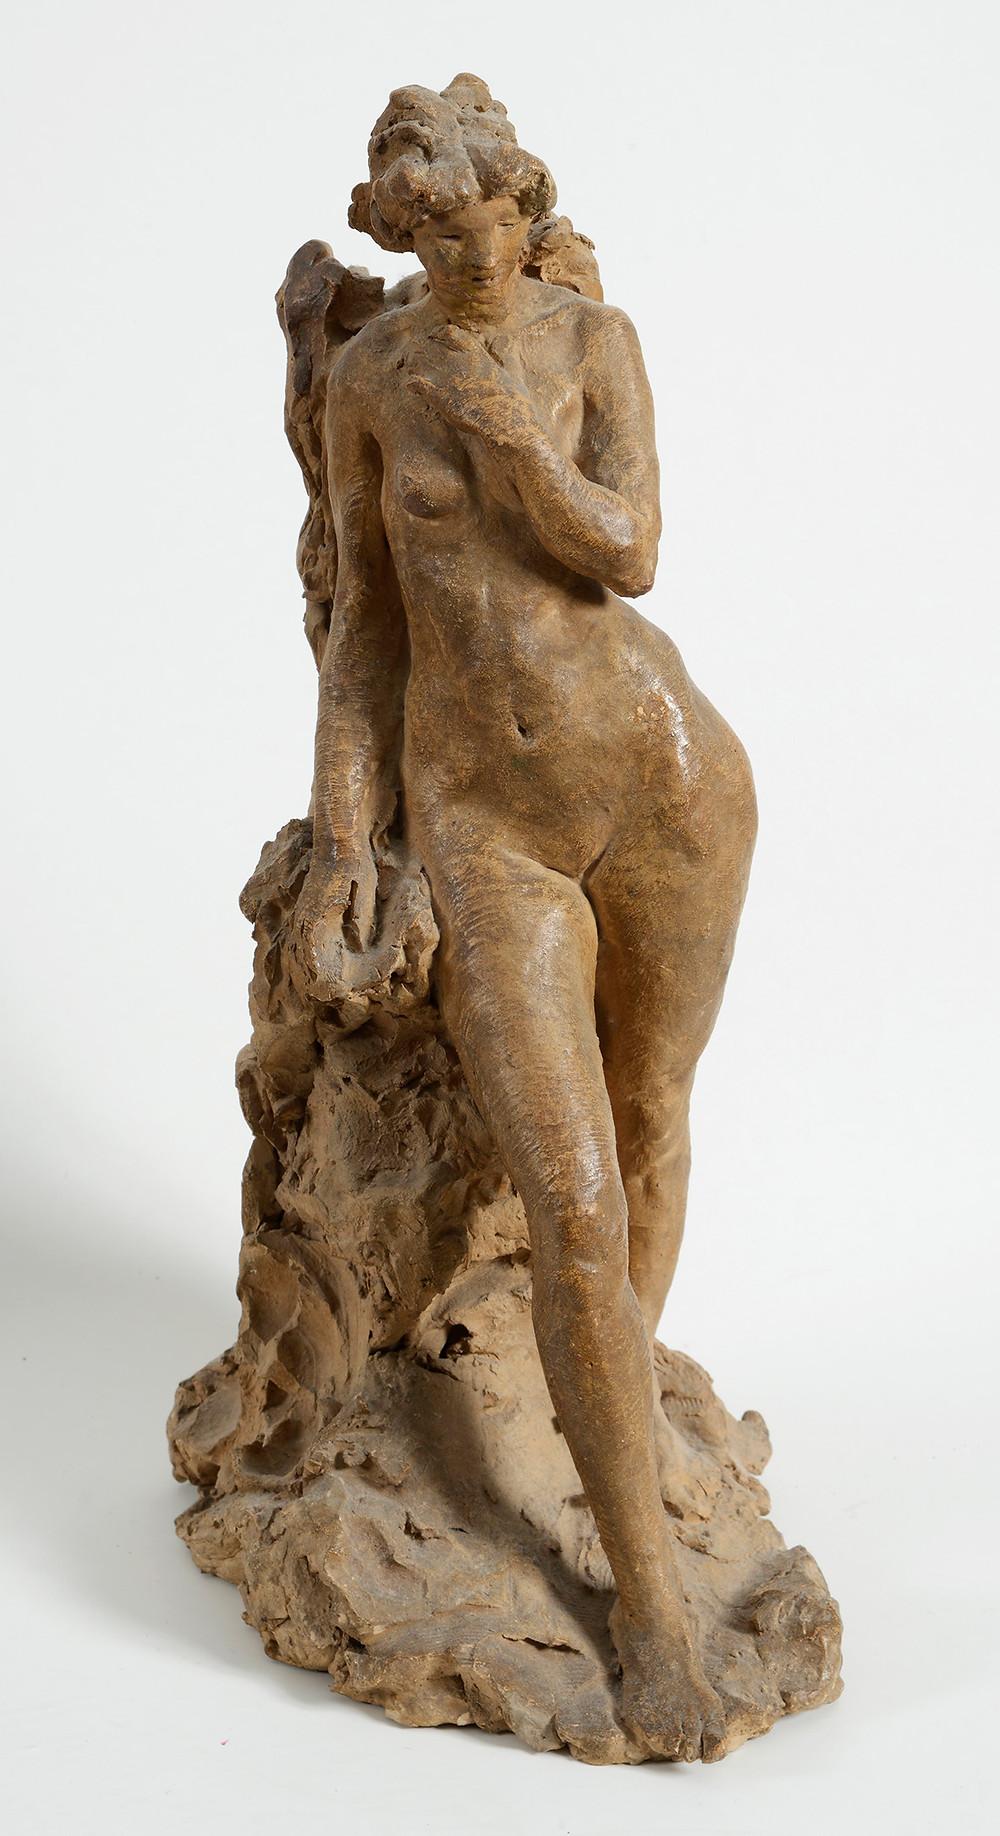 Sculpture Jean-Pierre GRAS, La  Rêverie, 1911 statuette terre cuite